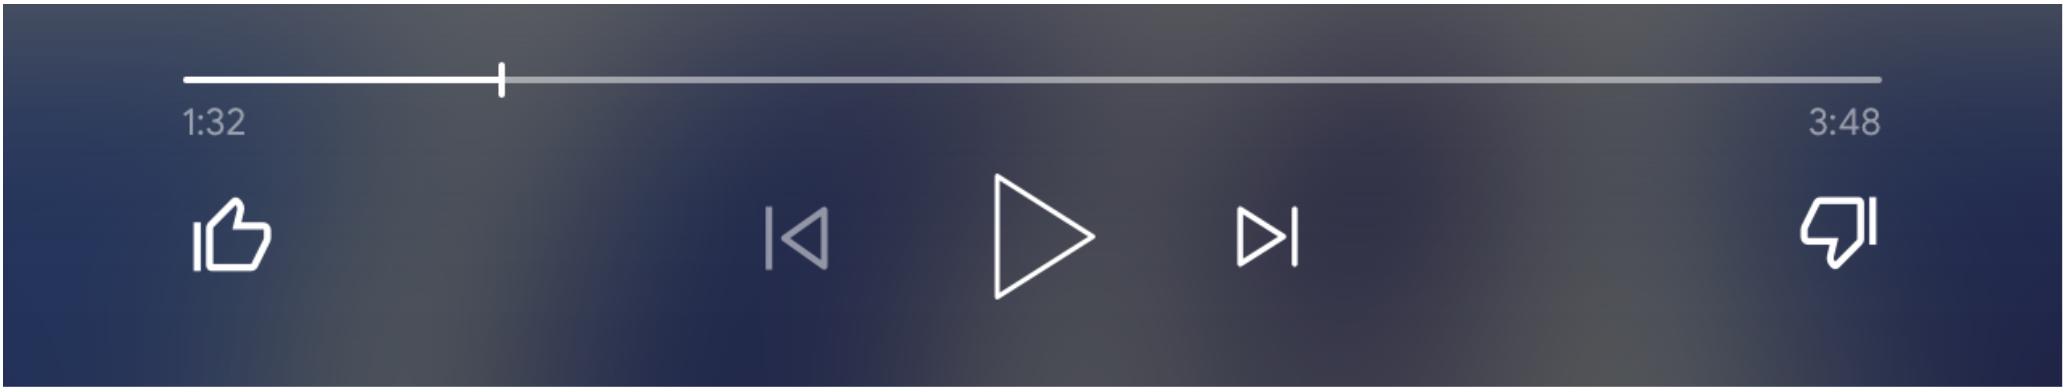 Customize CAF Receiver UI | Cast | Google Developers